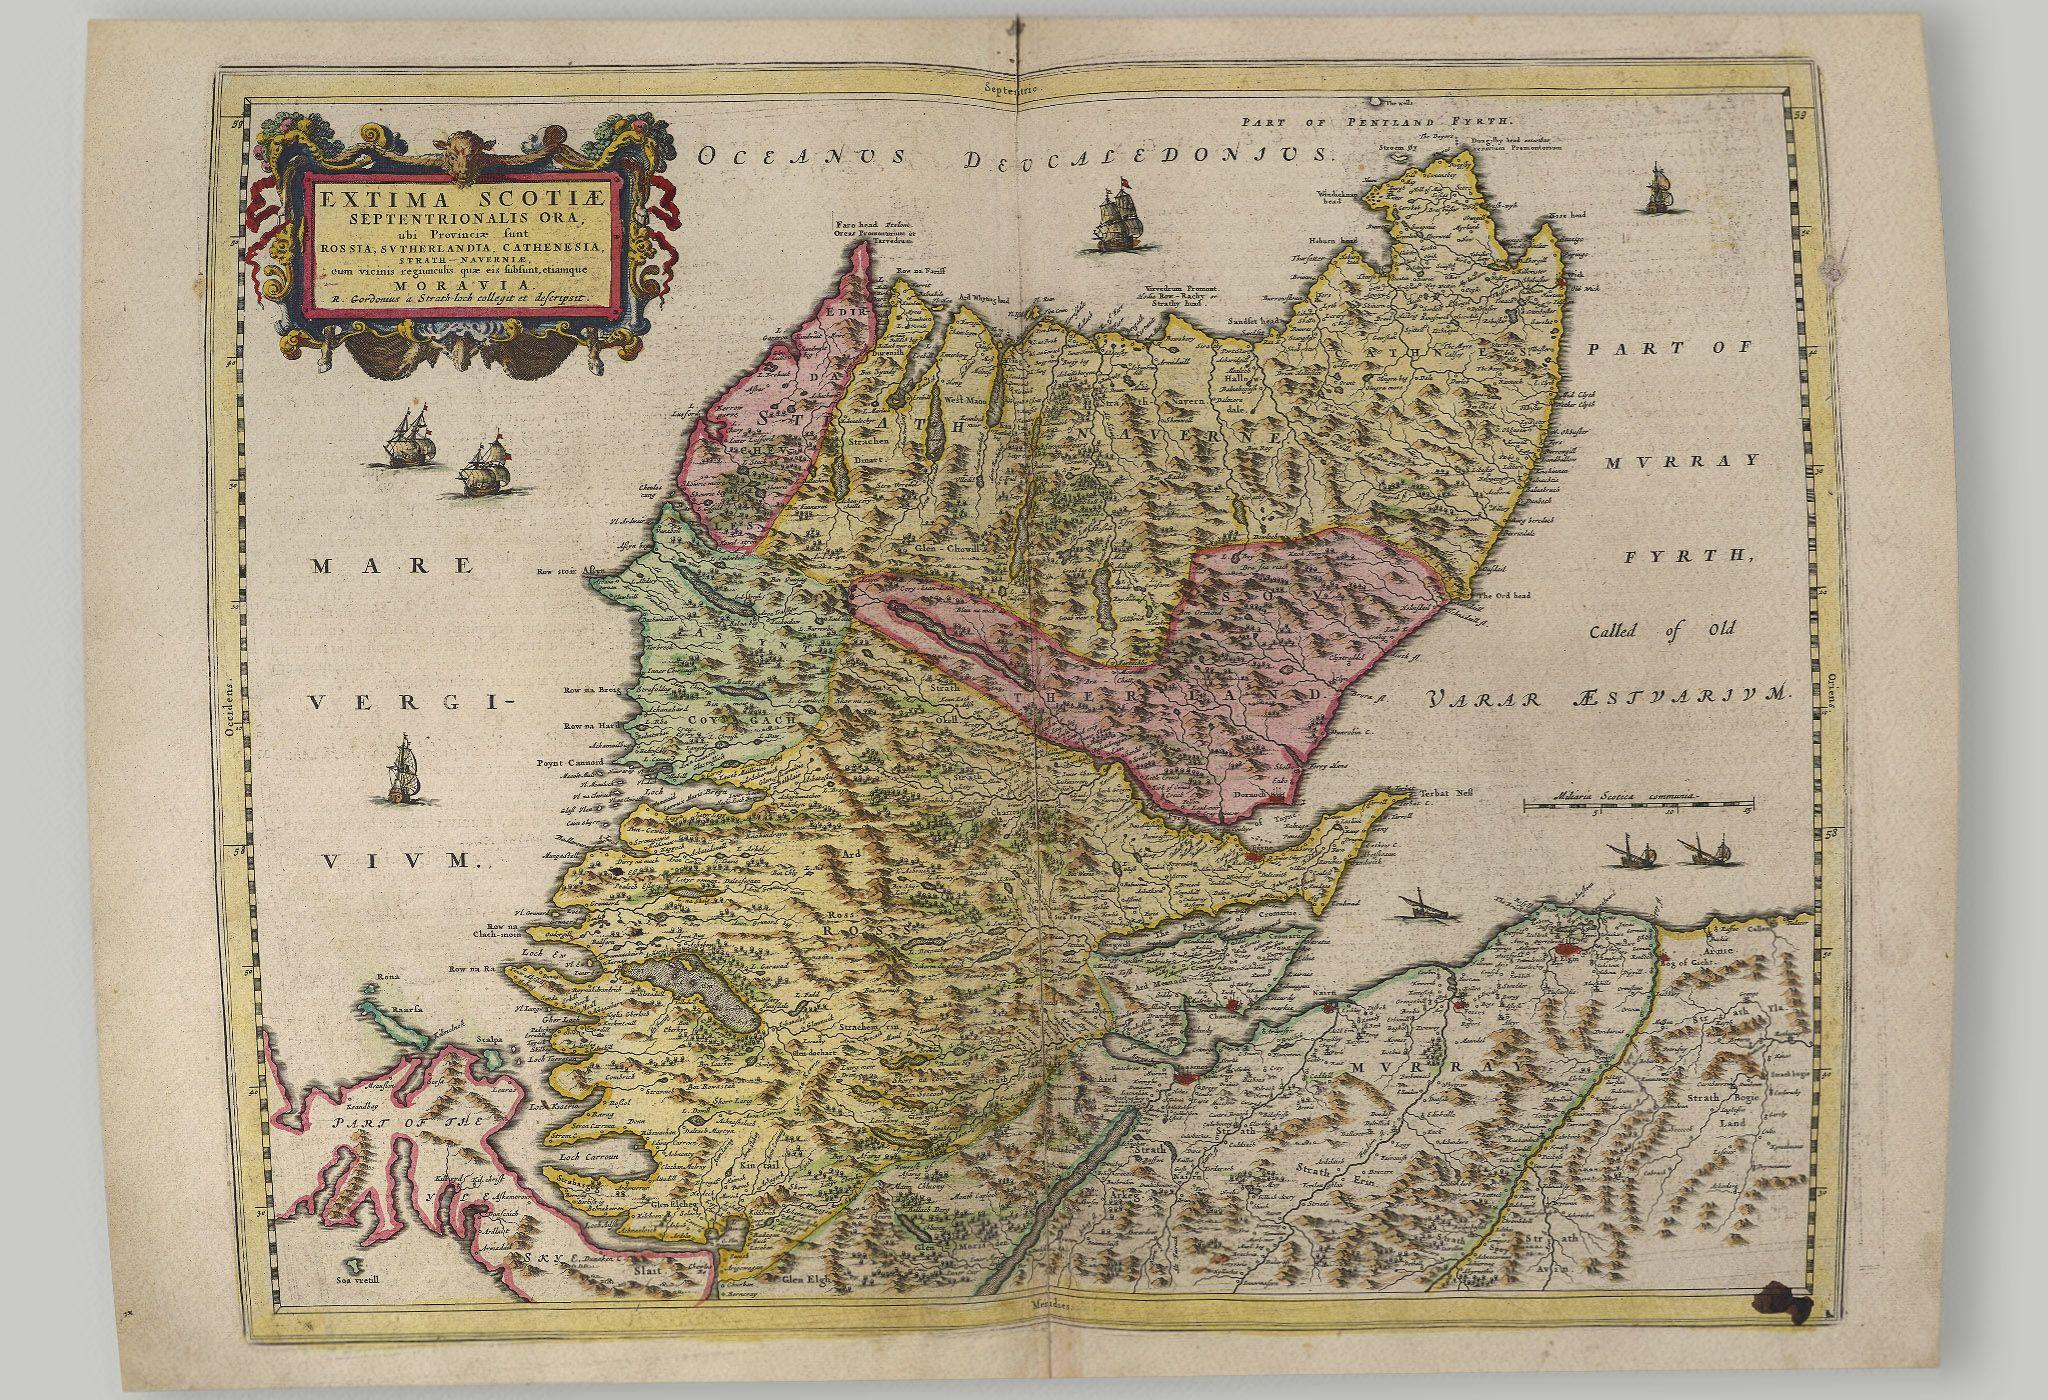 Old Map of The Highlands of Scotland, Scotland   Blaeu Prints – Buy